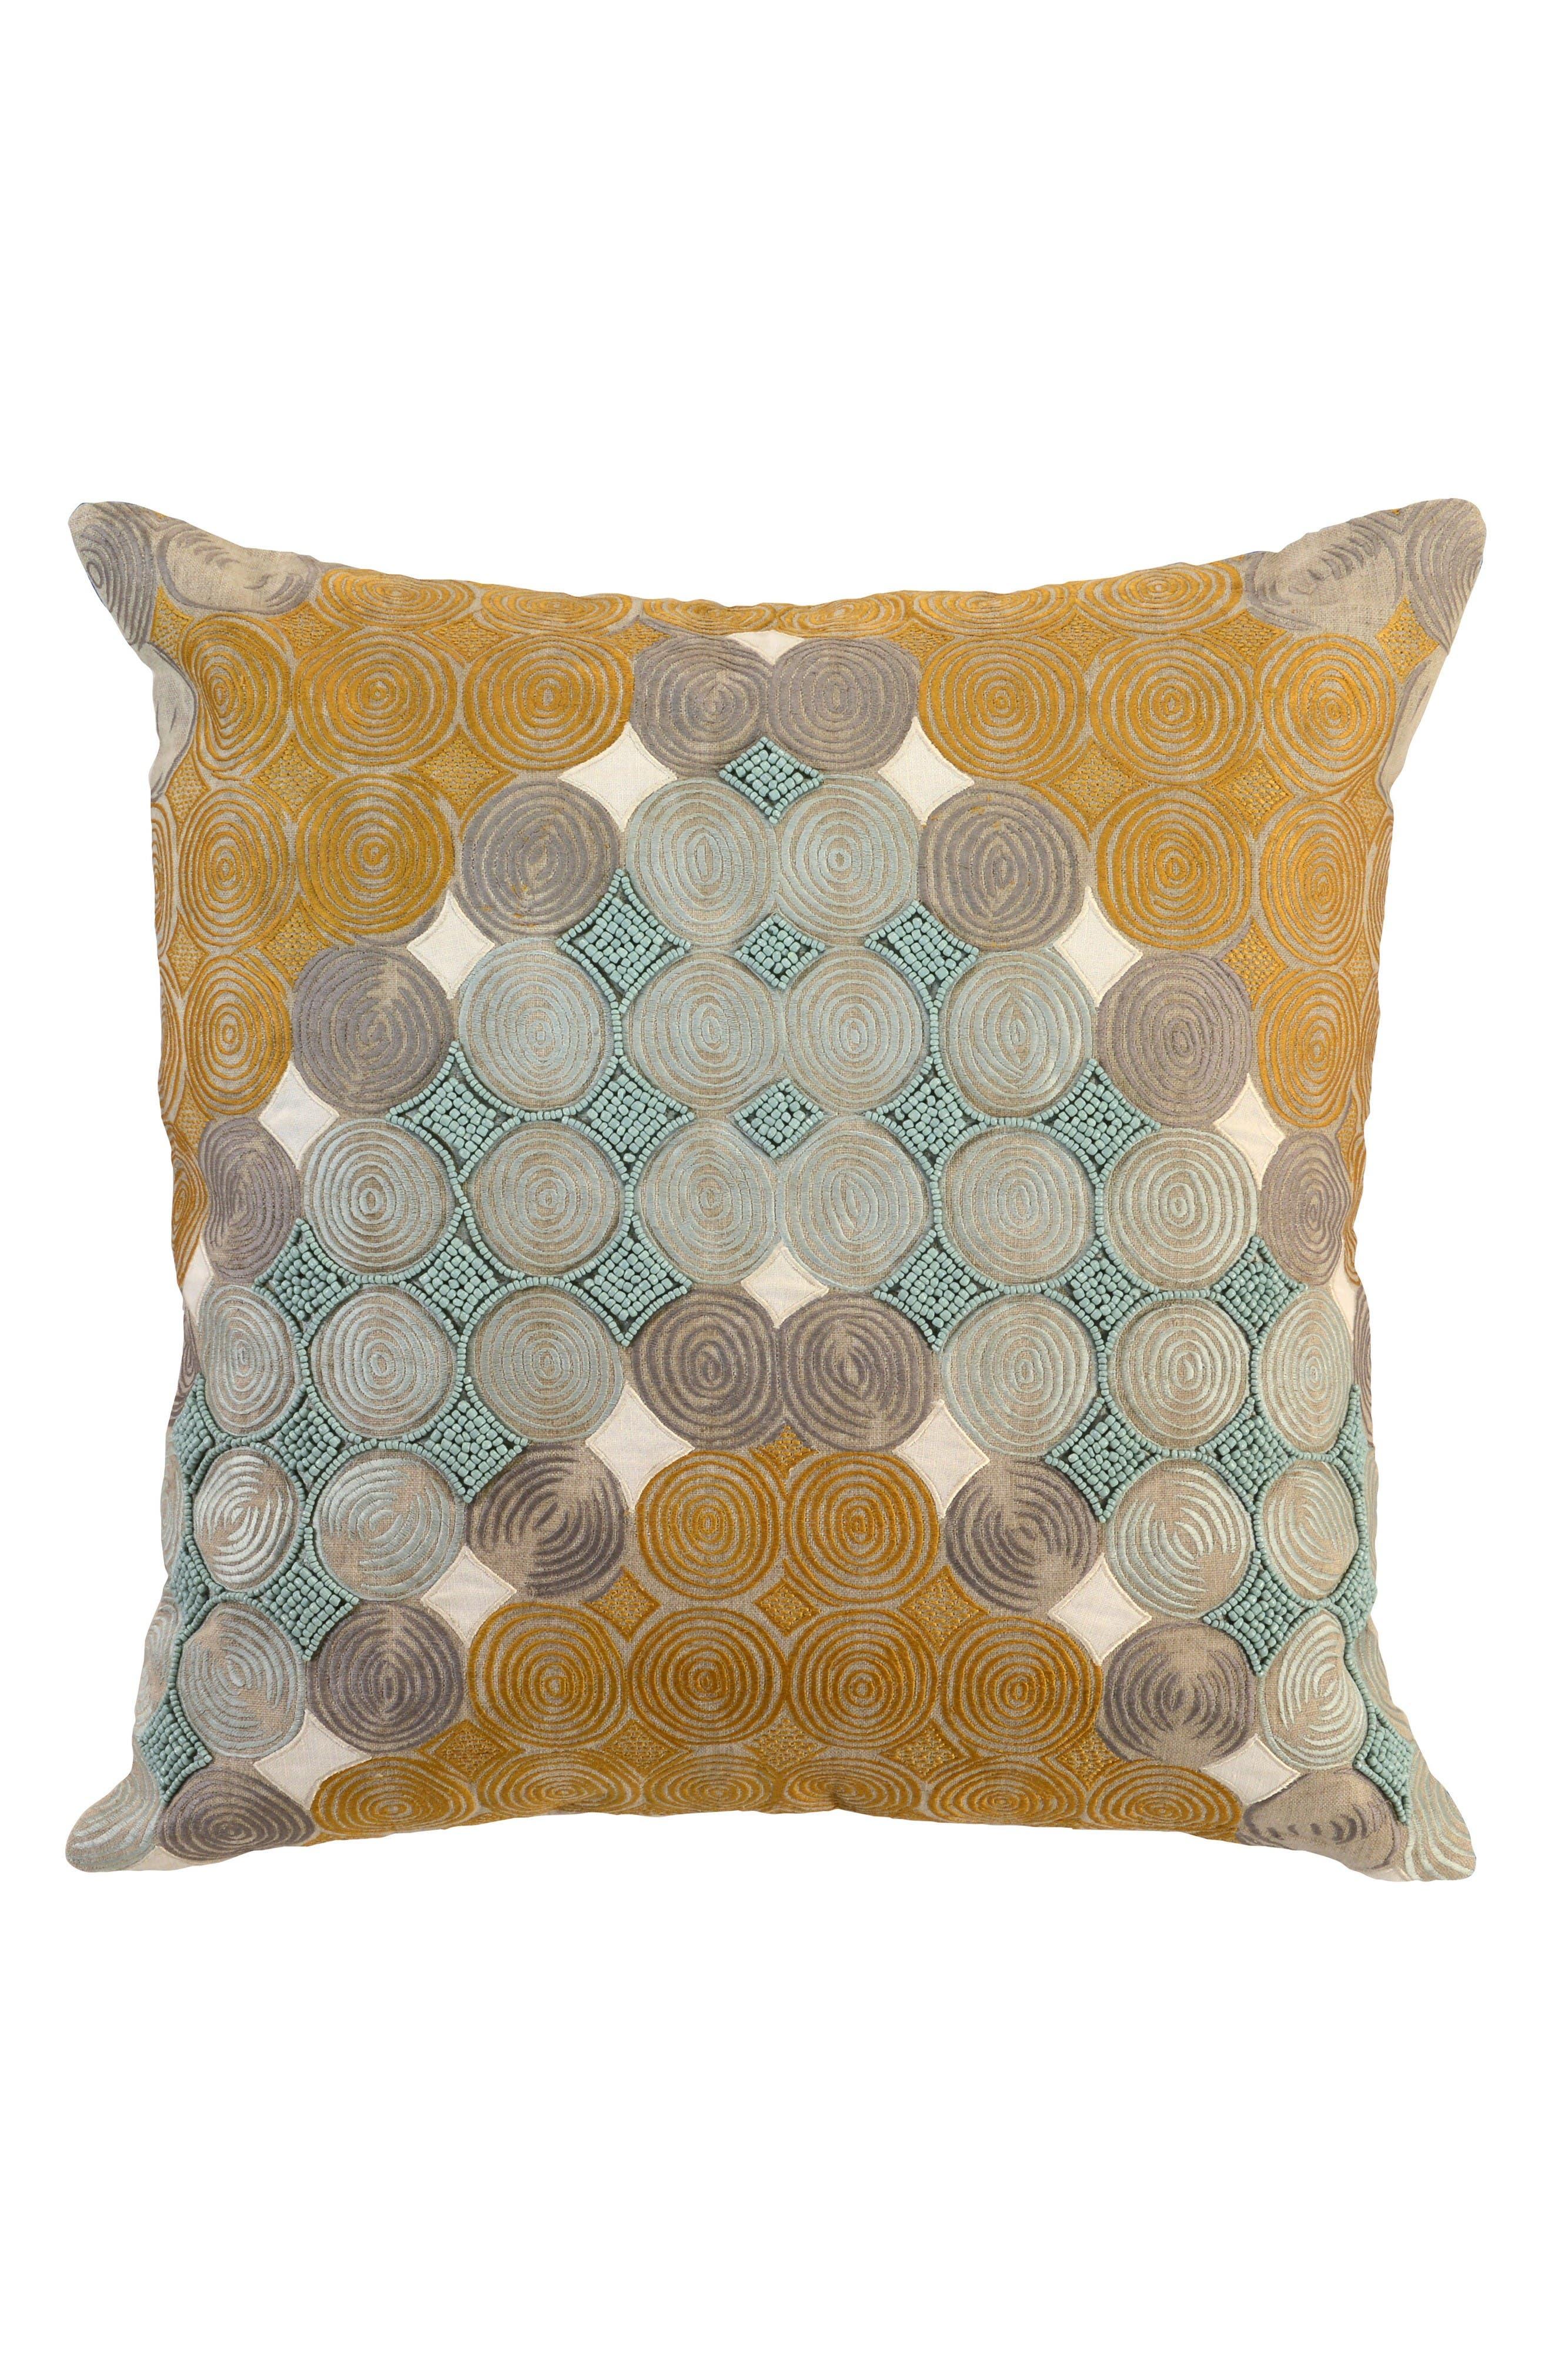 Villa Home Collection Mazza Tidal Accent Pillow